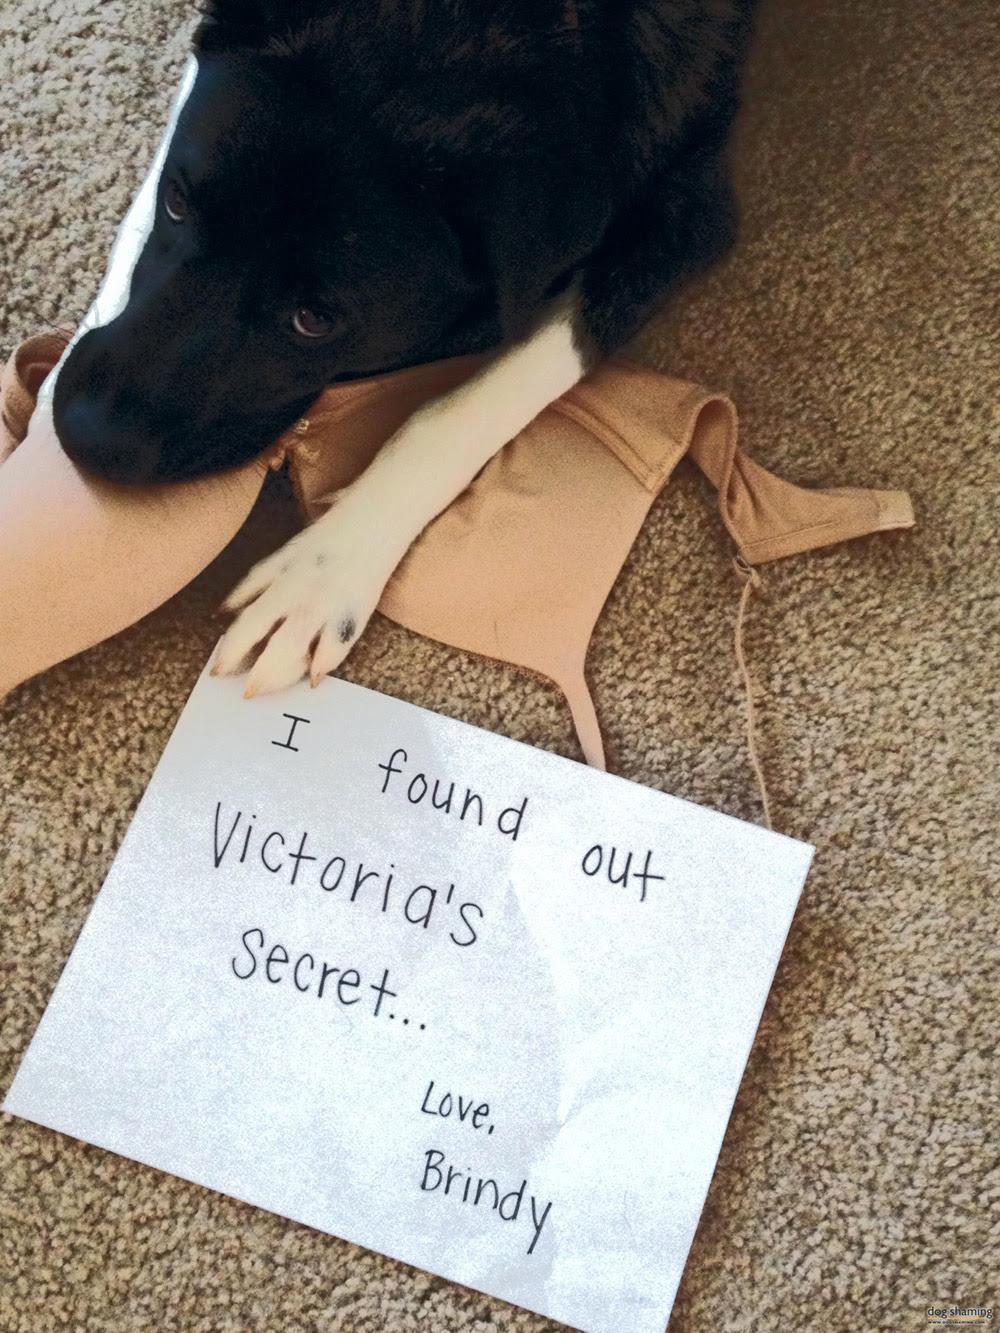 dog shaming 21 32 Hillarious Public Shaming of Dogs